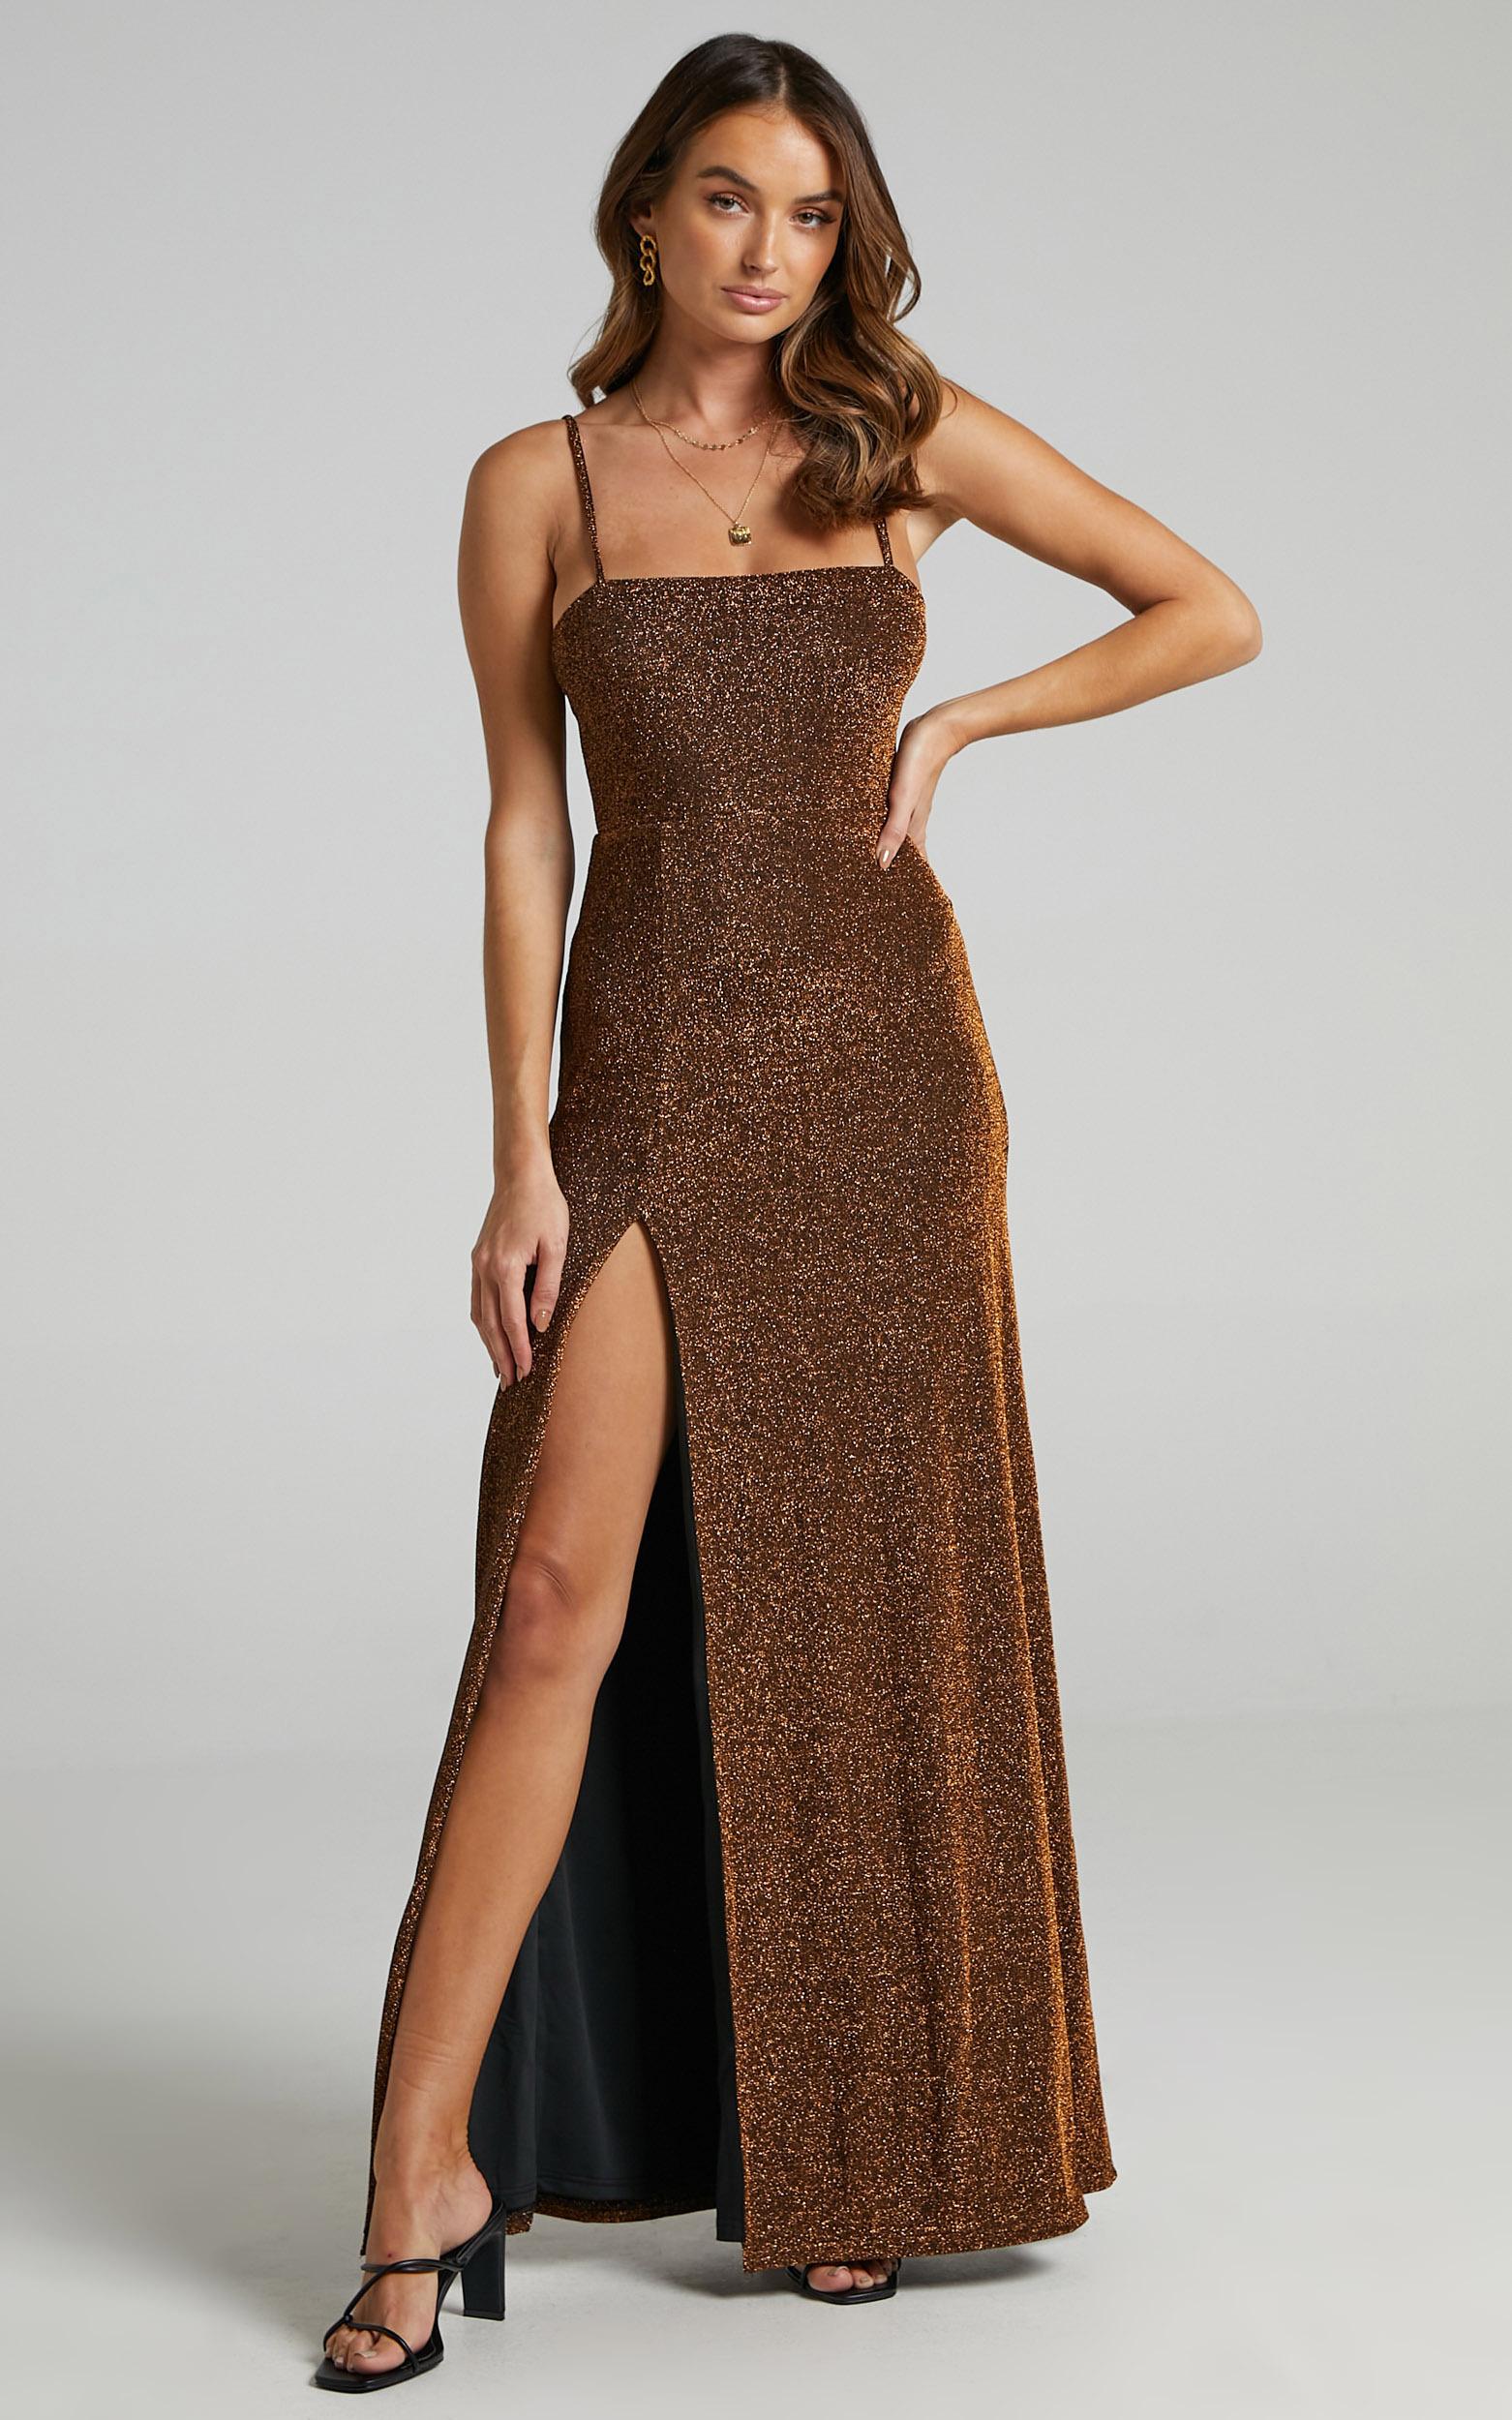 Rheannon Split Mesh Maxi Dress in Copper Lurex - 06, BRN2, hi-res image number null